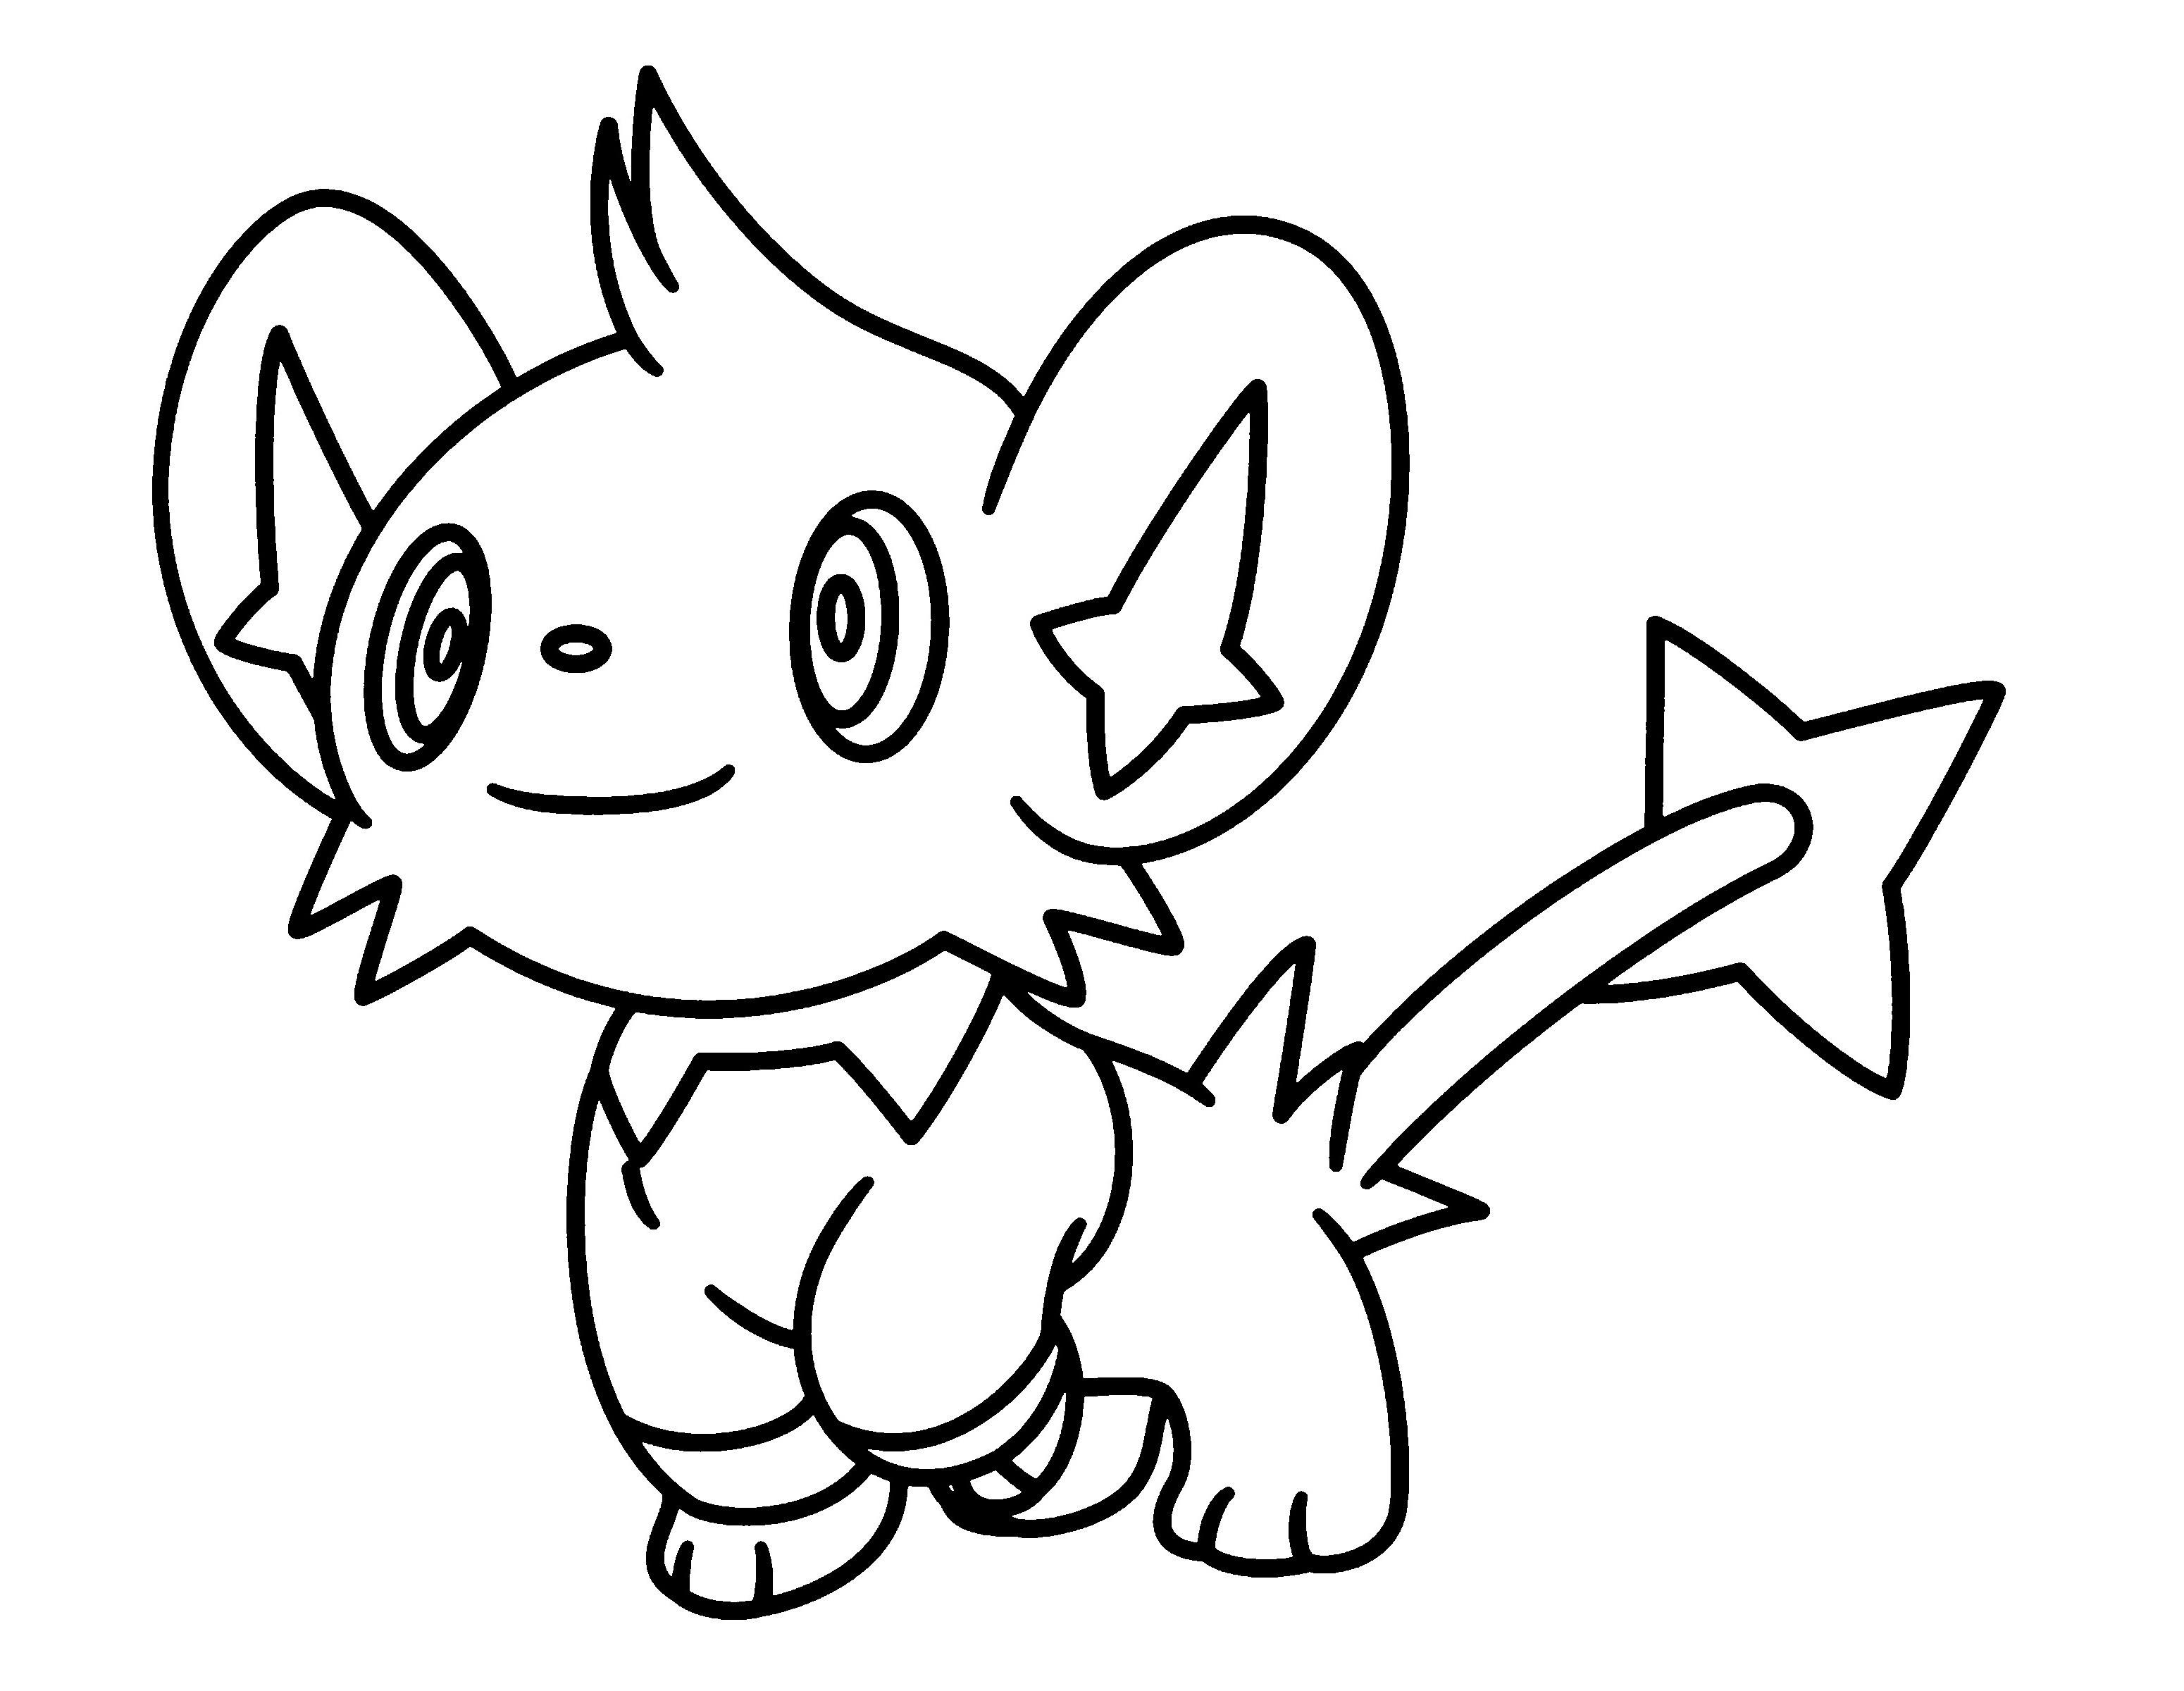 3100x2400 Maxresdefault Pokemon Drawing